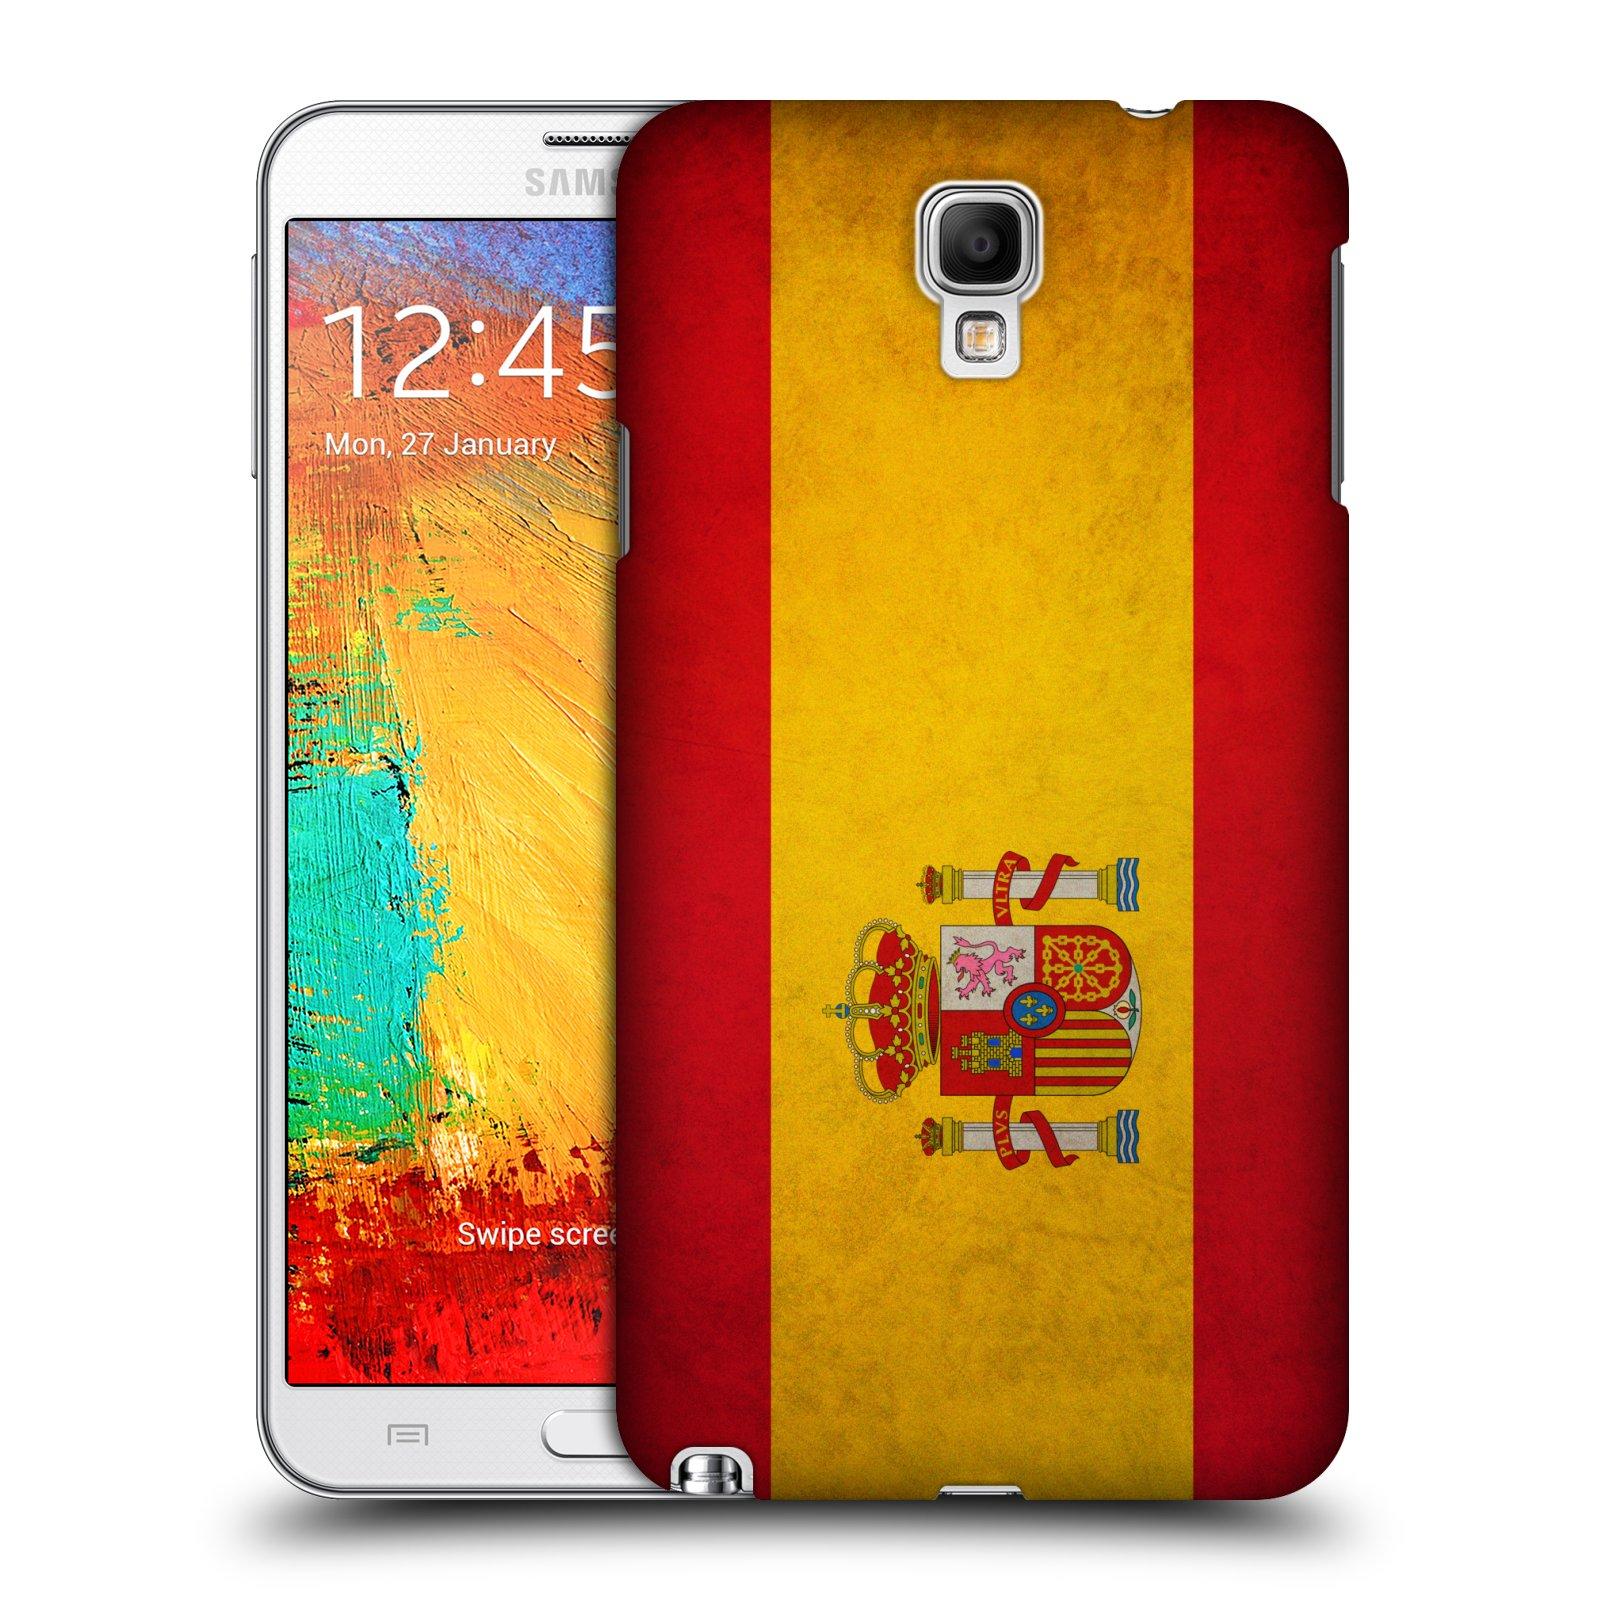 Plastové pouzdro na mobil Samsung Galaxy Note 3 Neo HEAD CASE VLAJKA ŠPANĚLSKO (Kryt či obal na mobilní telefon Samsung Galaxy Note 3 Neo SM-N7505)